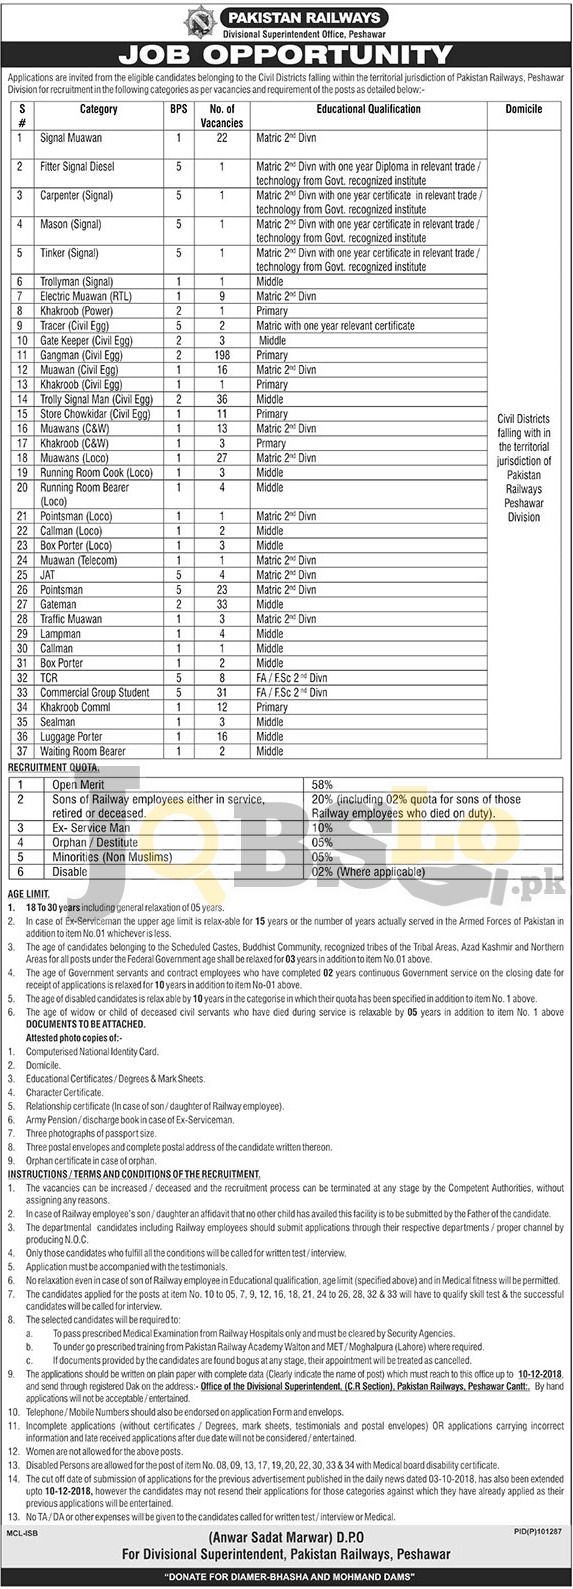 Pakistan Railway Jobs 2018 Peshawar Division Latest Current Openings